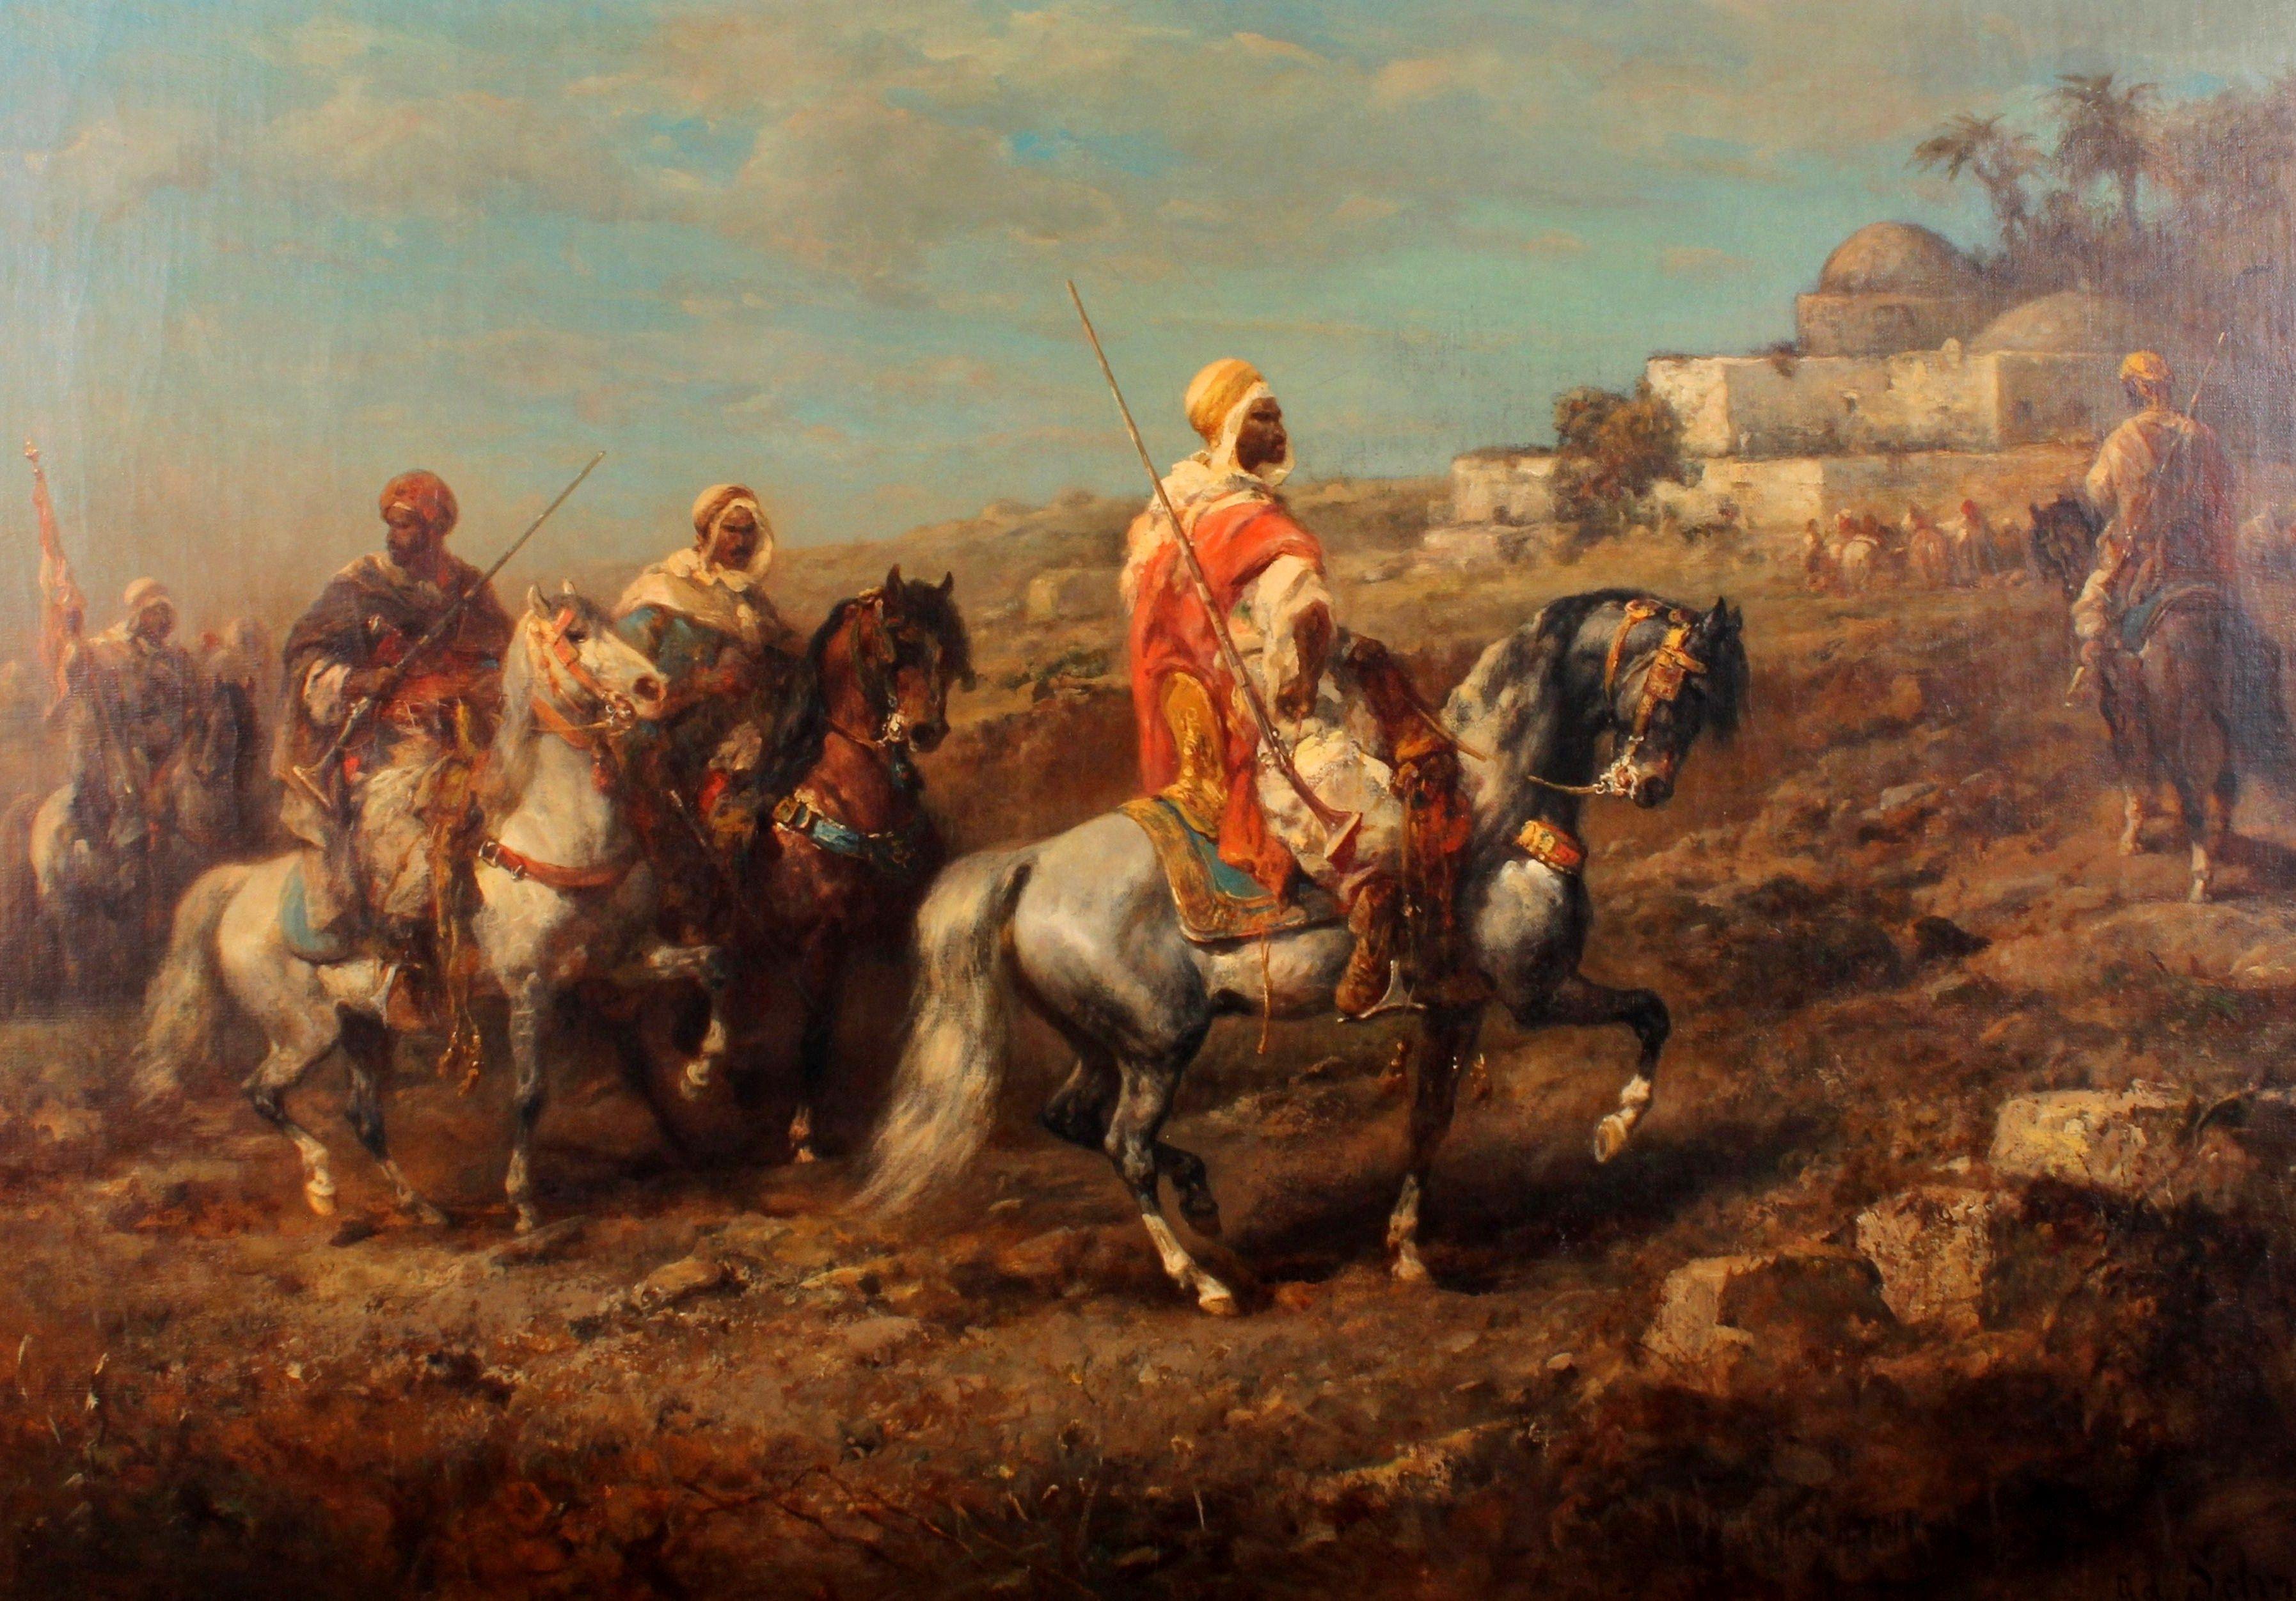 The Street Merchant elder Arab portrait on canvas Oil painting Ludwig Deutsch